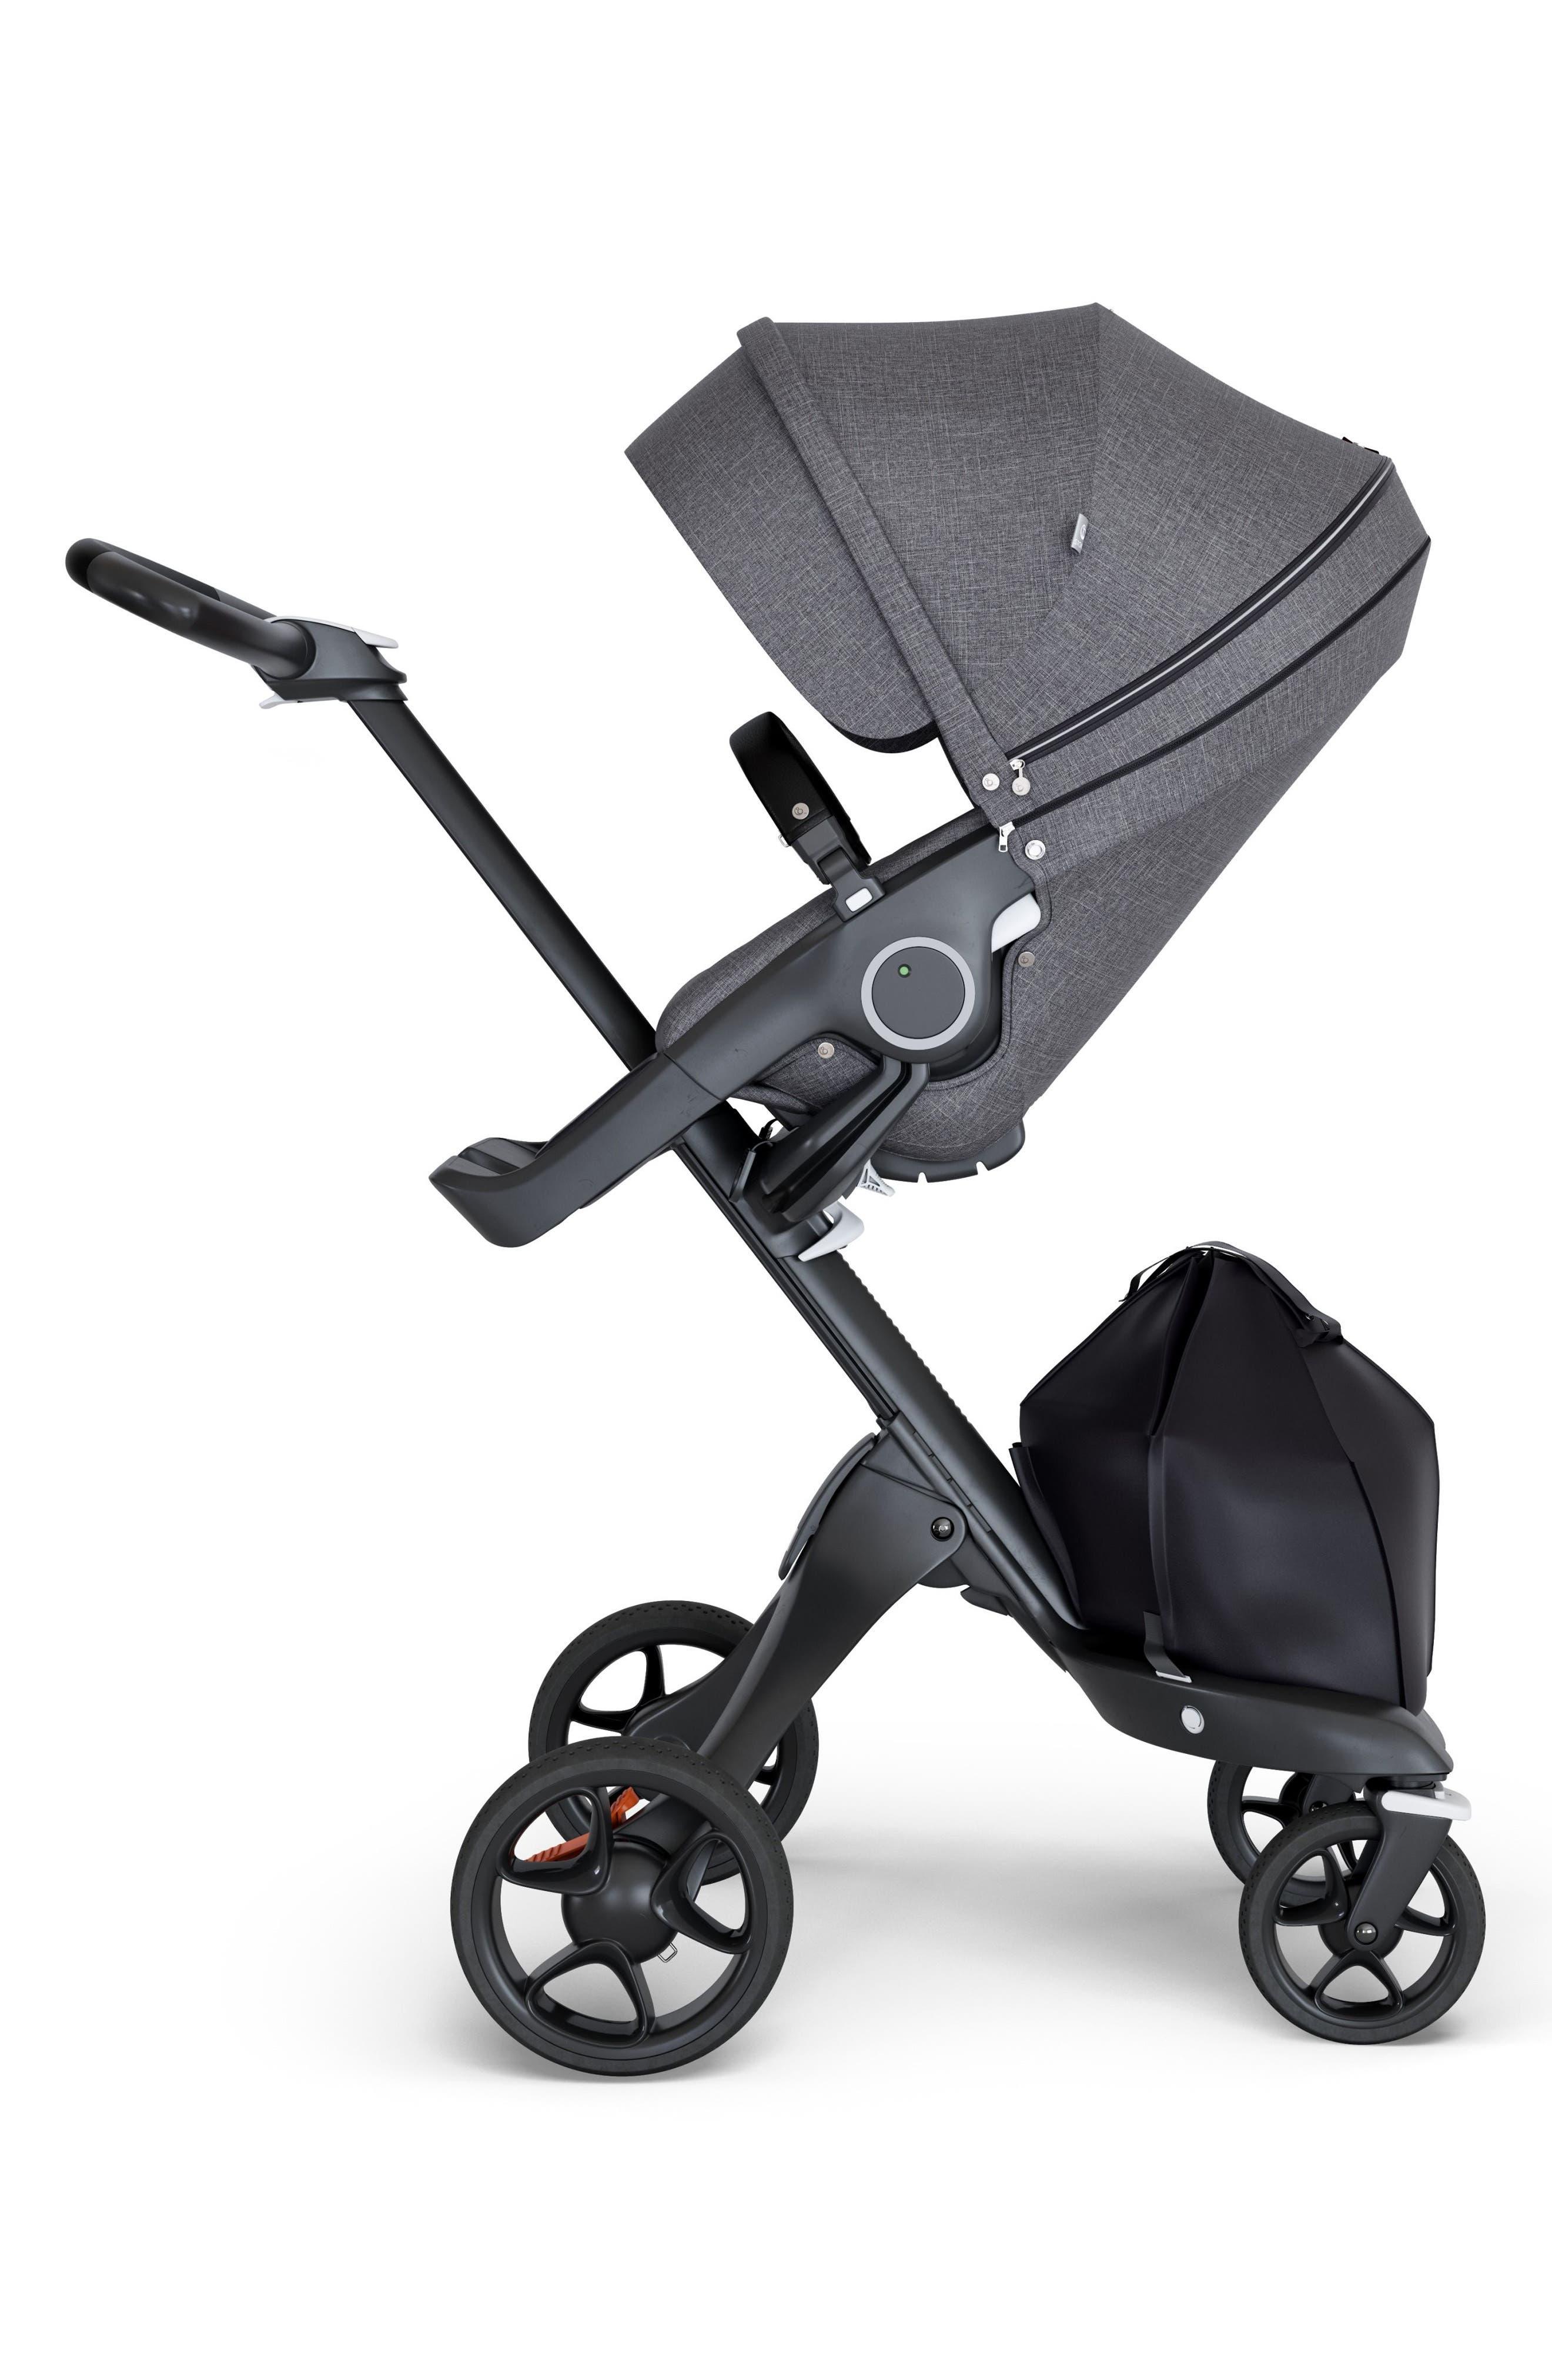 Xplory<sup>®</sup> Black Chassis Stroller,                             Main thumbnail 1, color,                             BLACK MELANGE